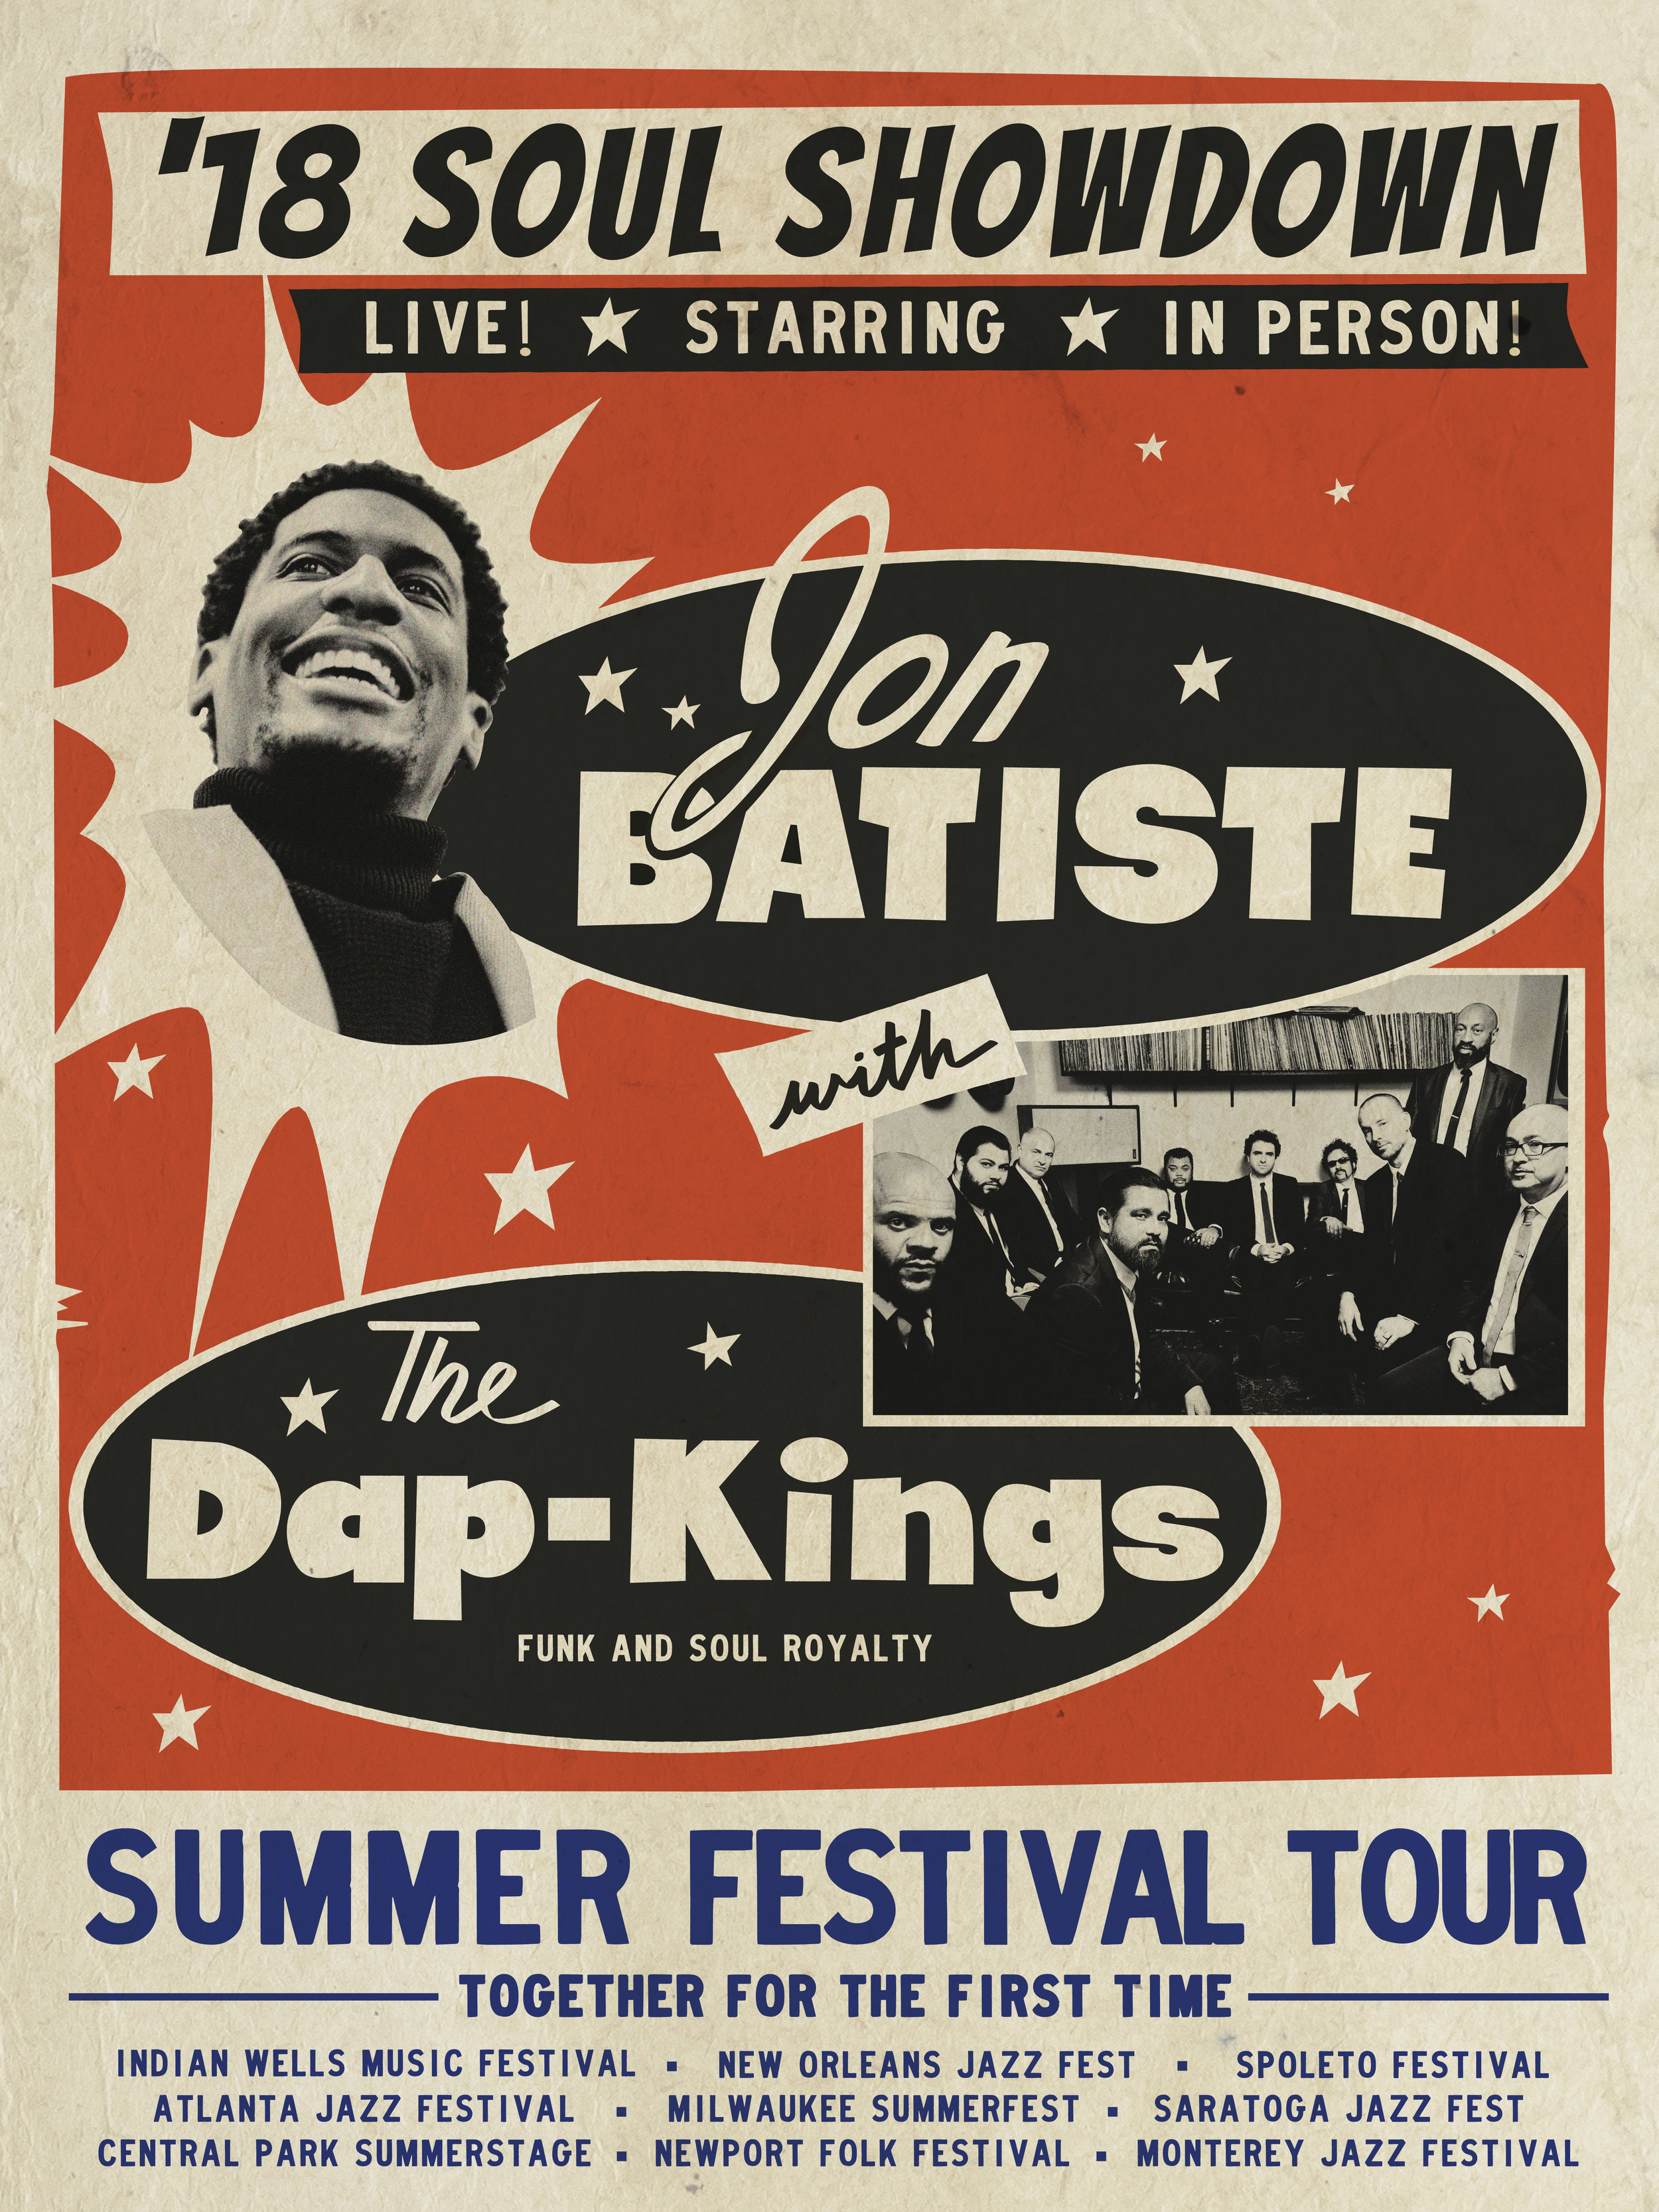 Jon Batitse & Dap Kings_Festival Tour.jpg